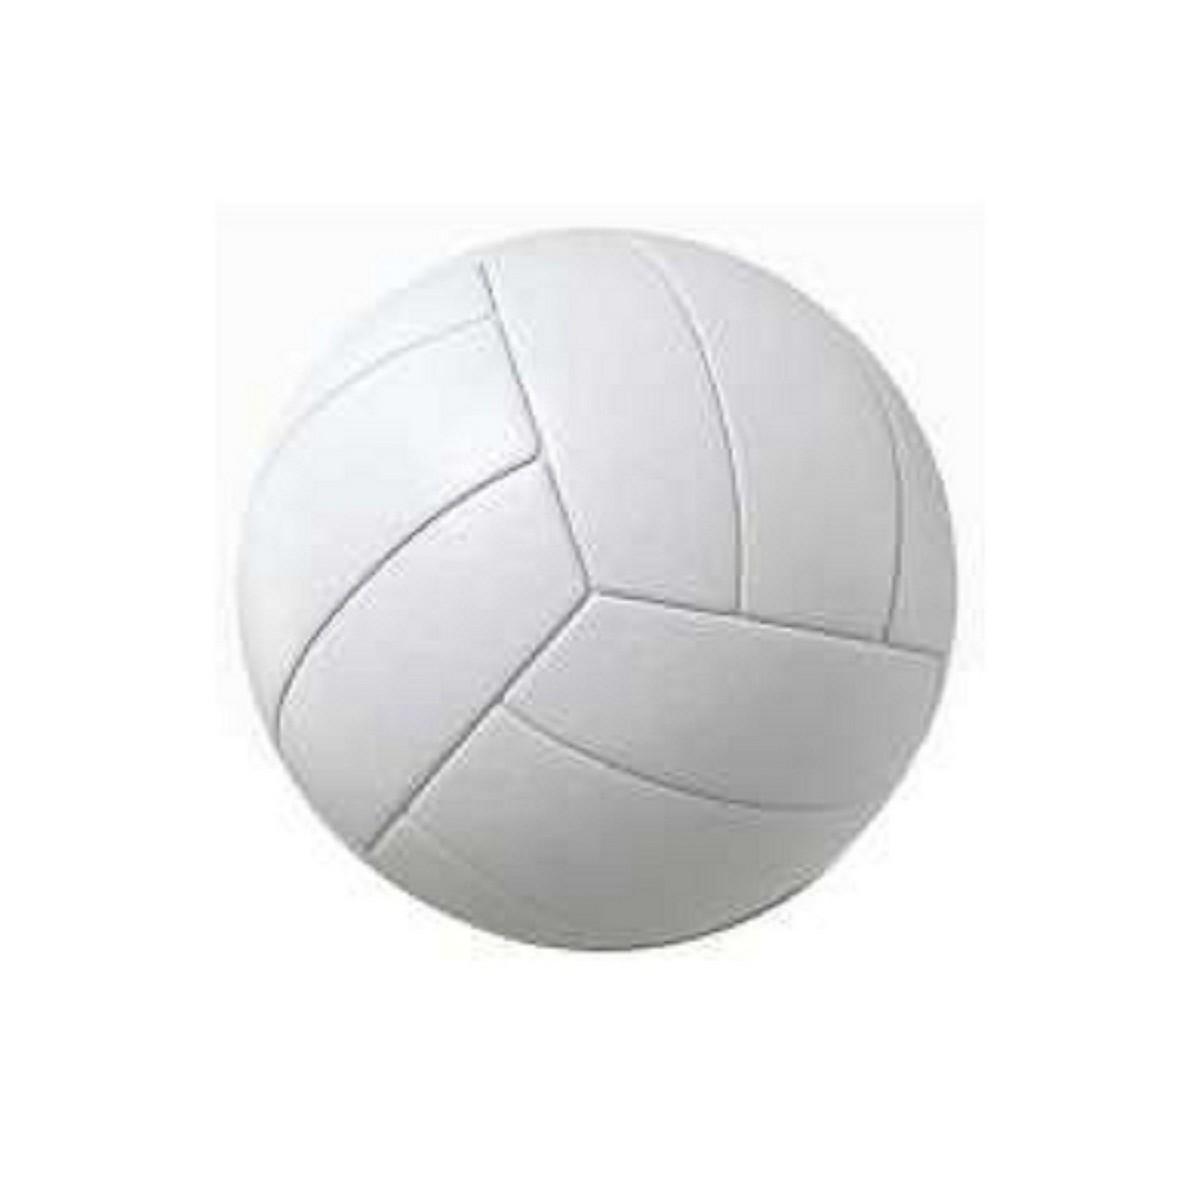 Mehtab Volley Ball (Supreme) - Free